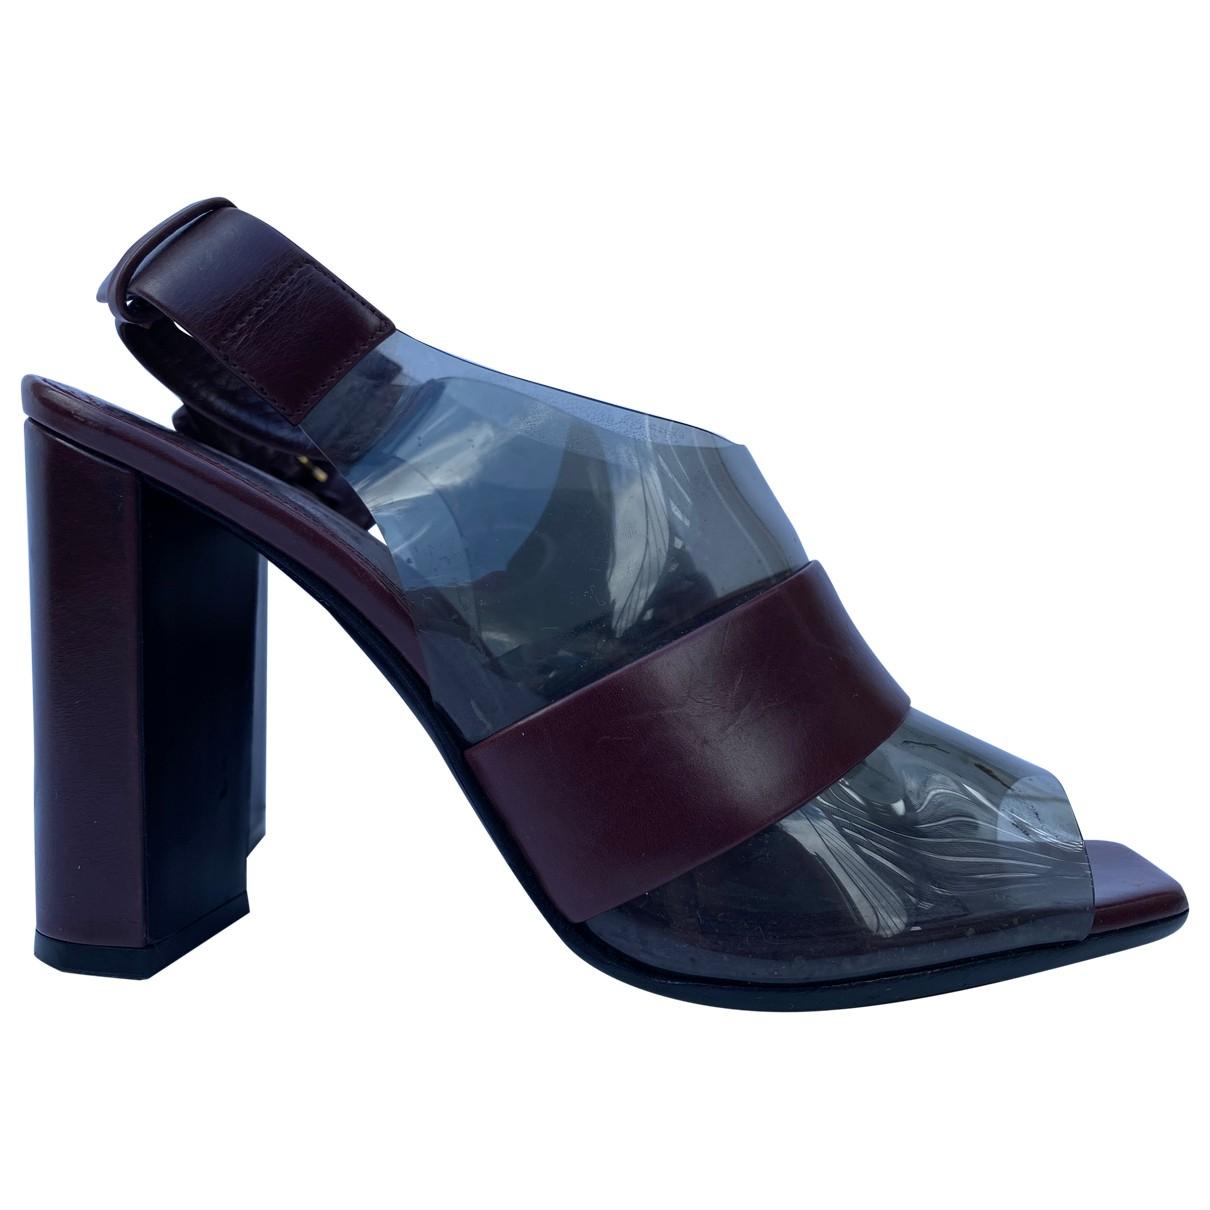 Celine \N Burgundy Leather Sandals for Women 36.5 EU